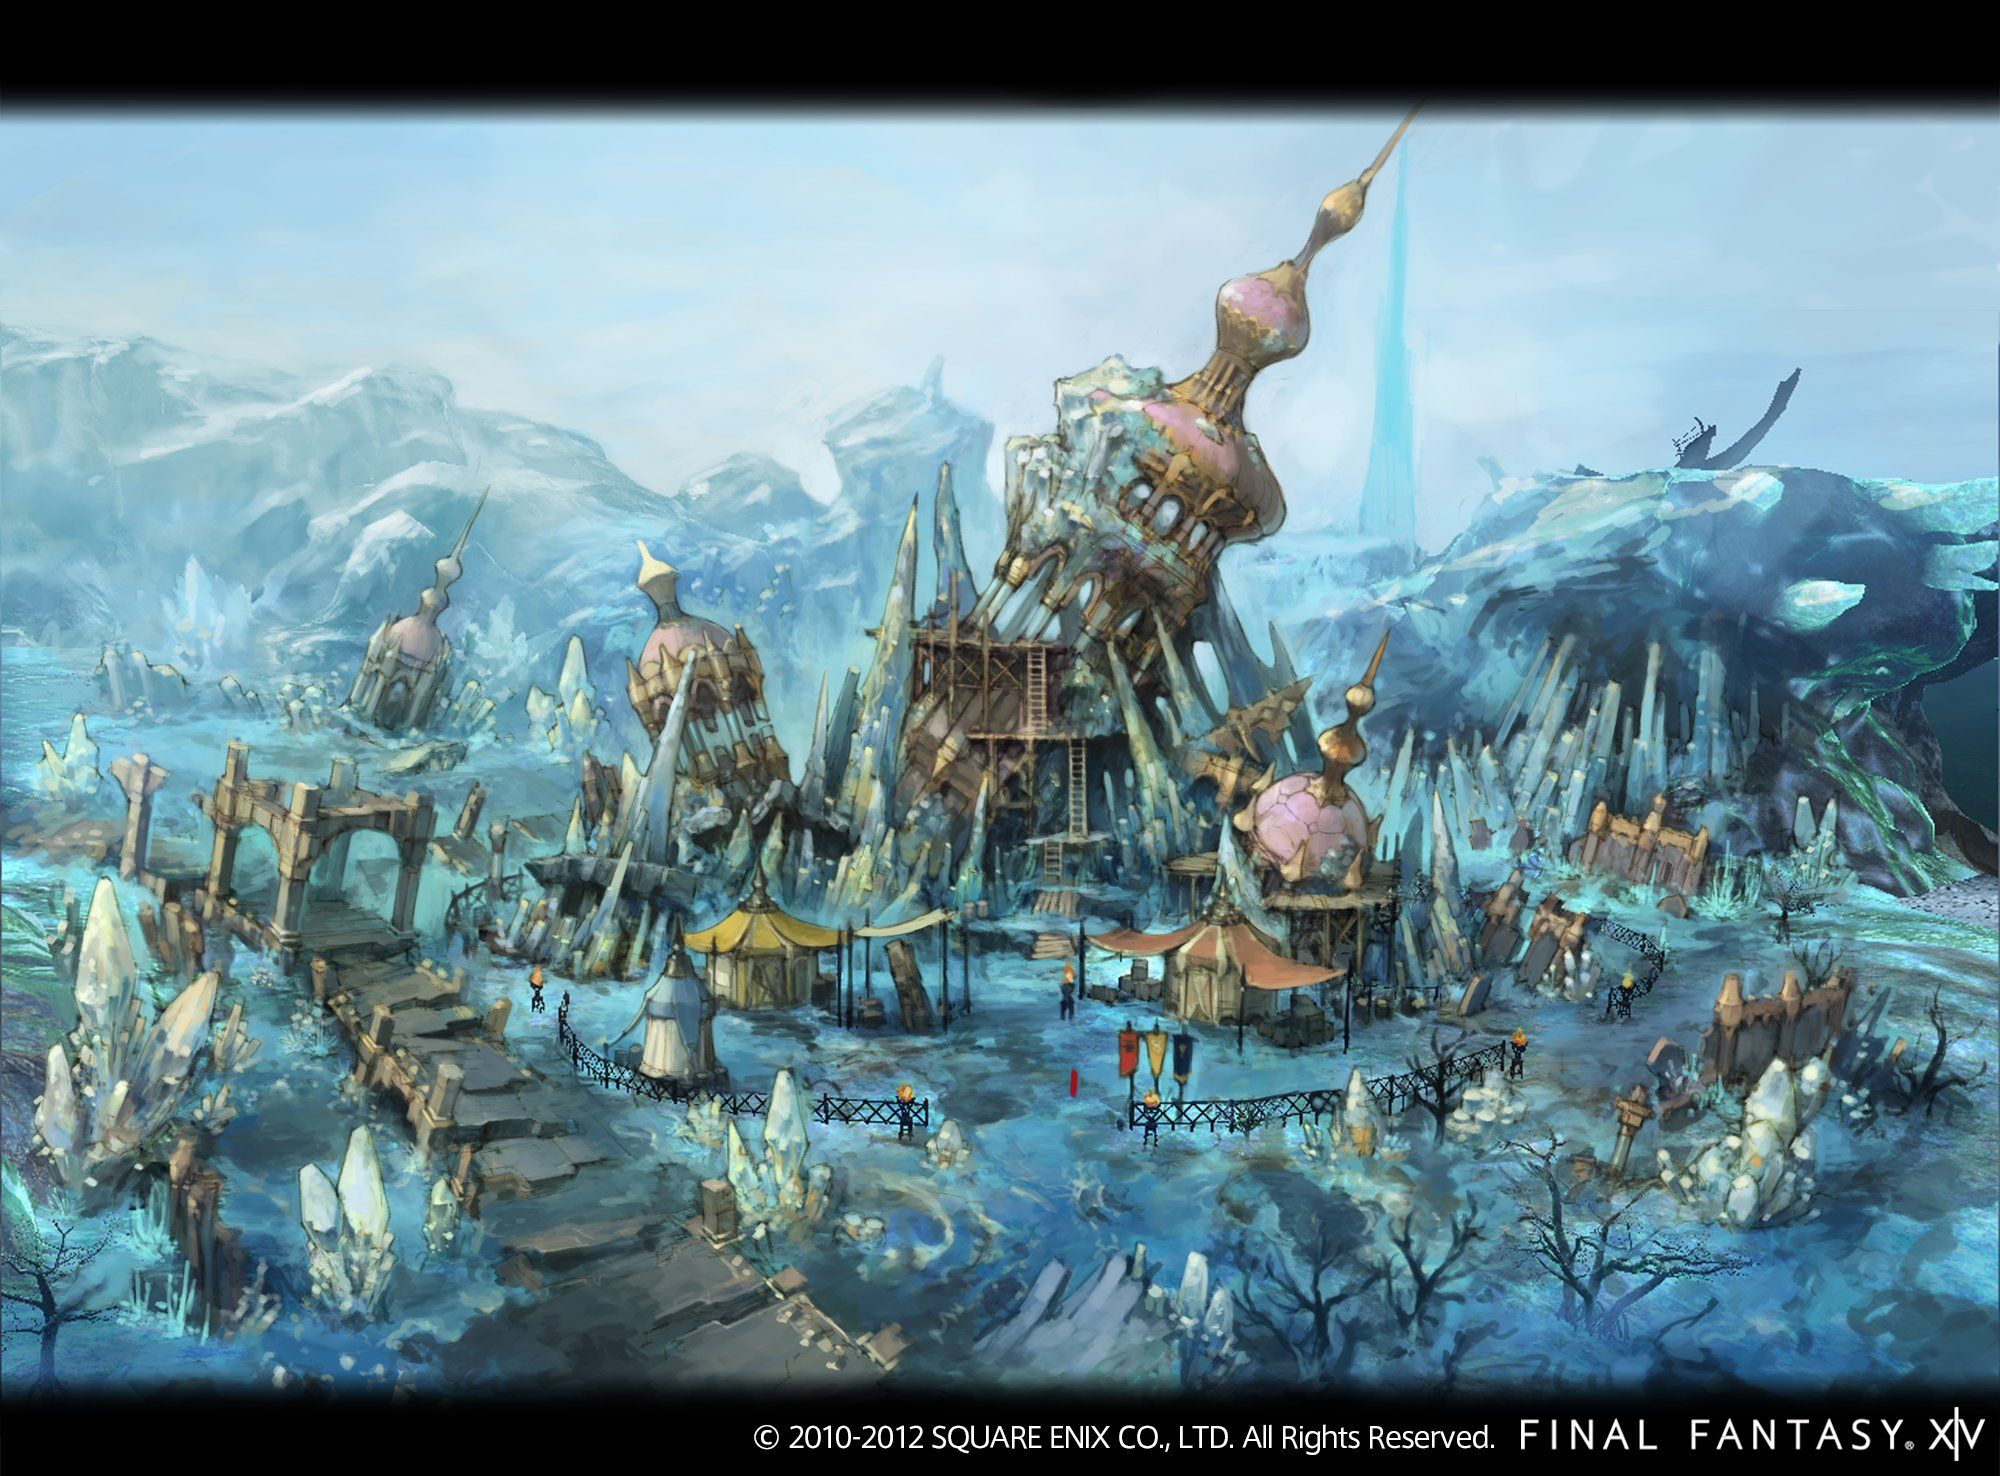 Mor Dhona Ffxiv Fantasy Landscape Environment Concept Art Final Fantasy Xiv